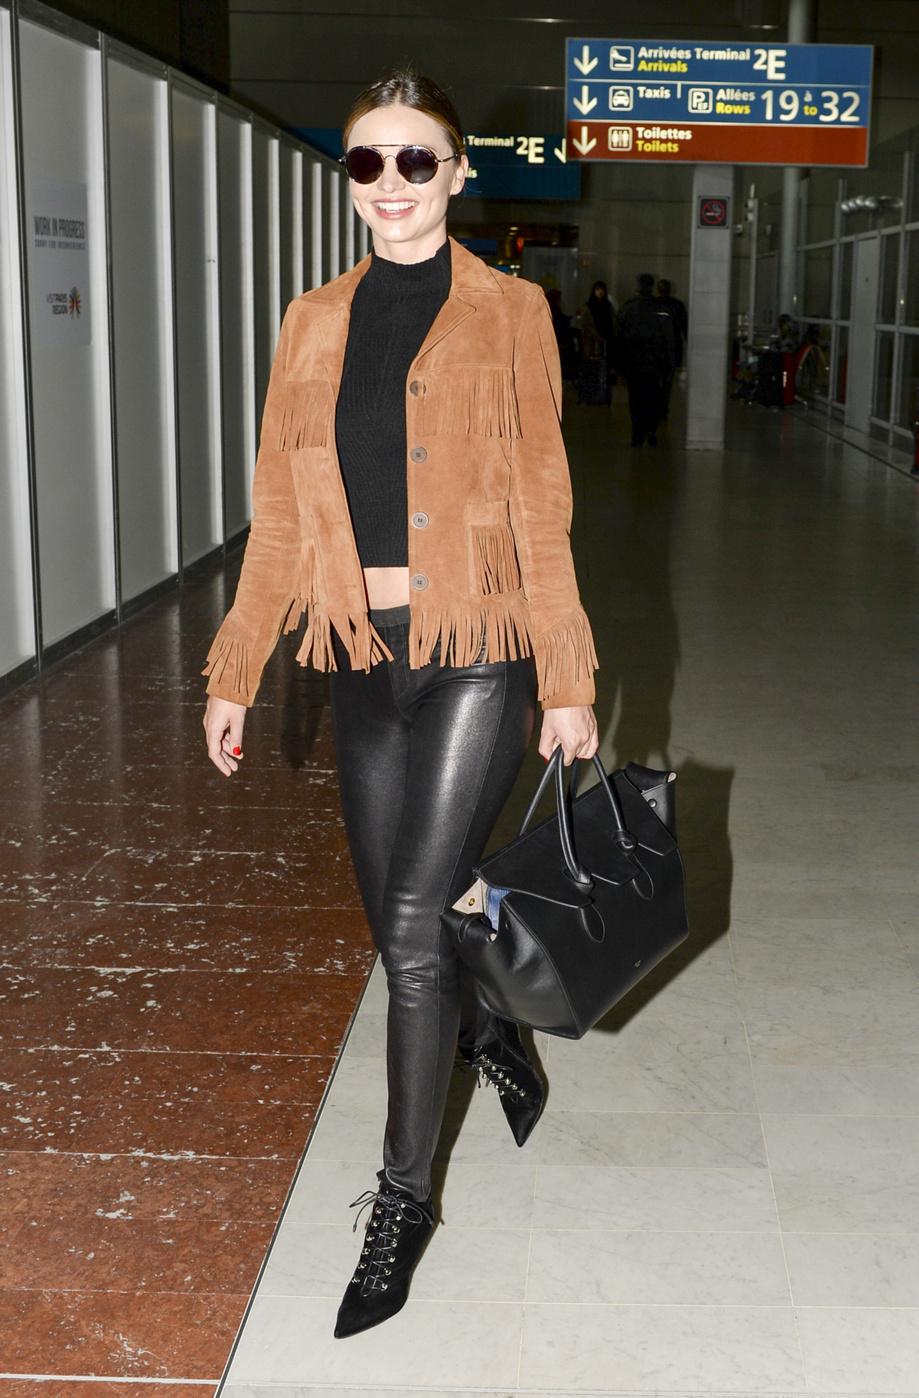 MirandaKerrSuedeLaceUpBooties - 8 ways to wear leather pants like a Rockstar!